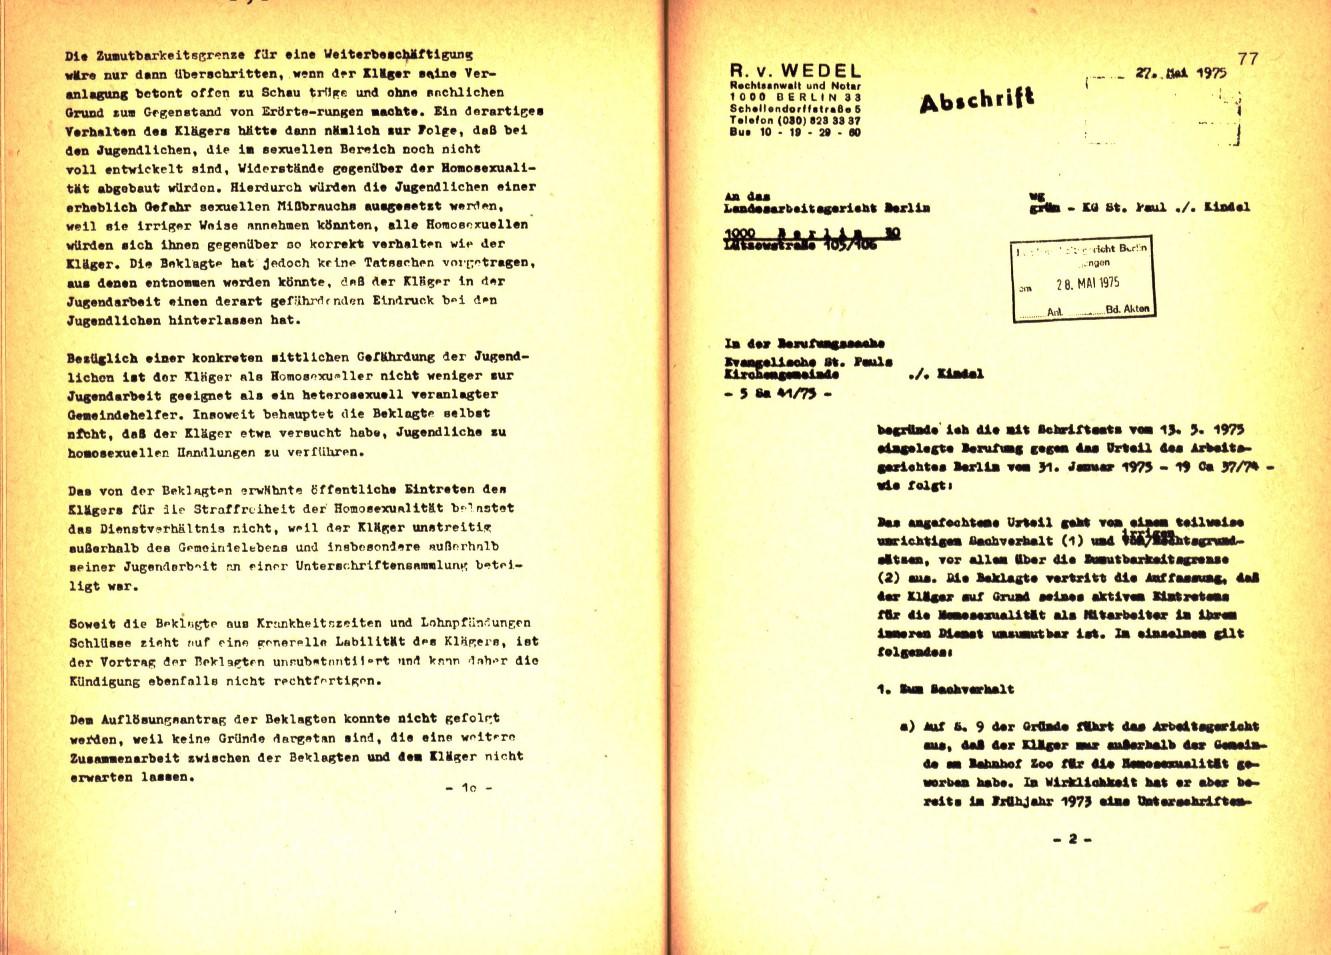 Berlin_VDS_Aktionskomitee_1975_BerufsverboteII_40